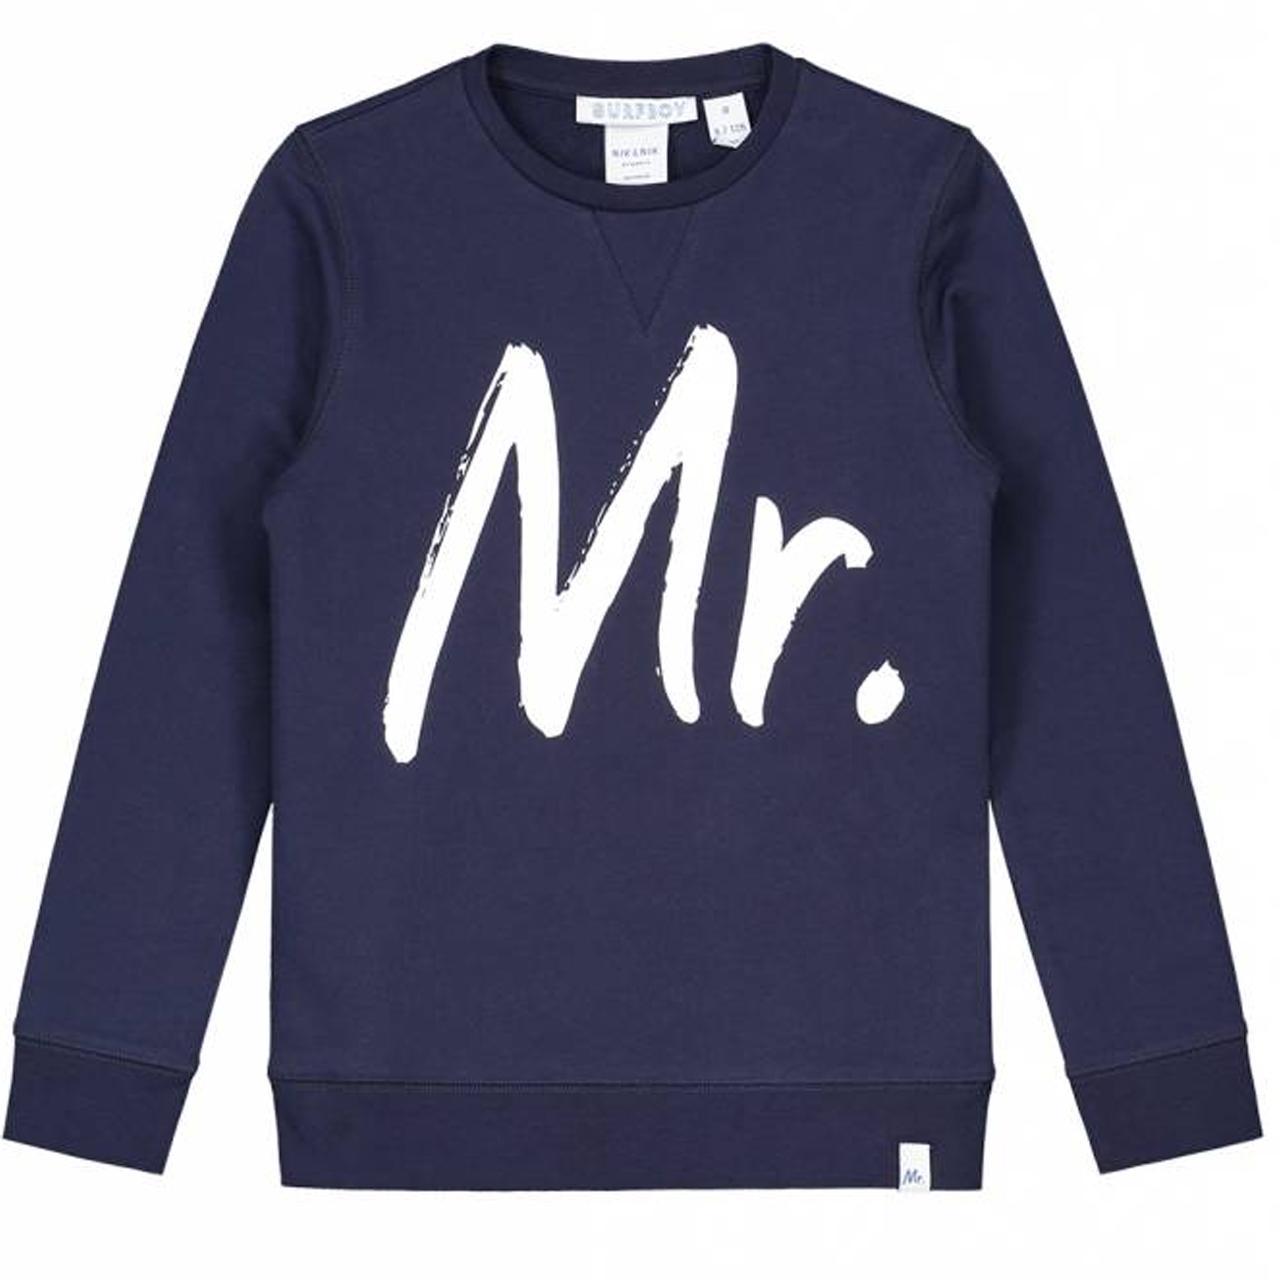 Sweaters amp; Truien B 018 Vesten Nik 1804 Donkerblauw 8 ap4YY